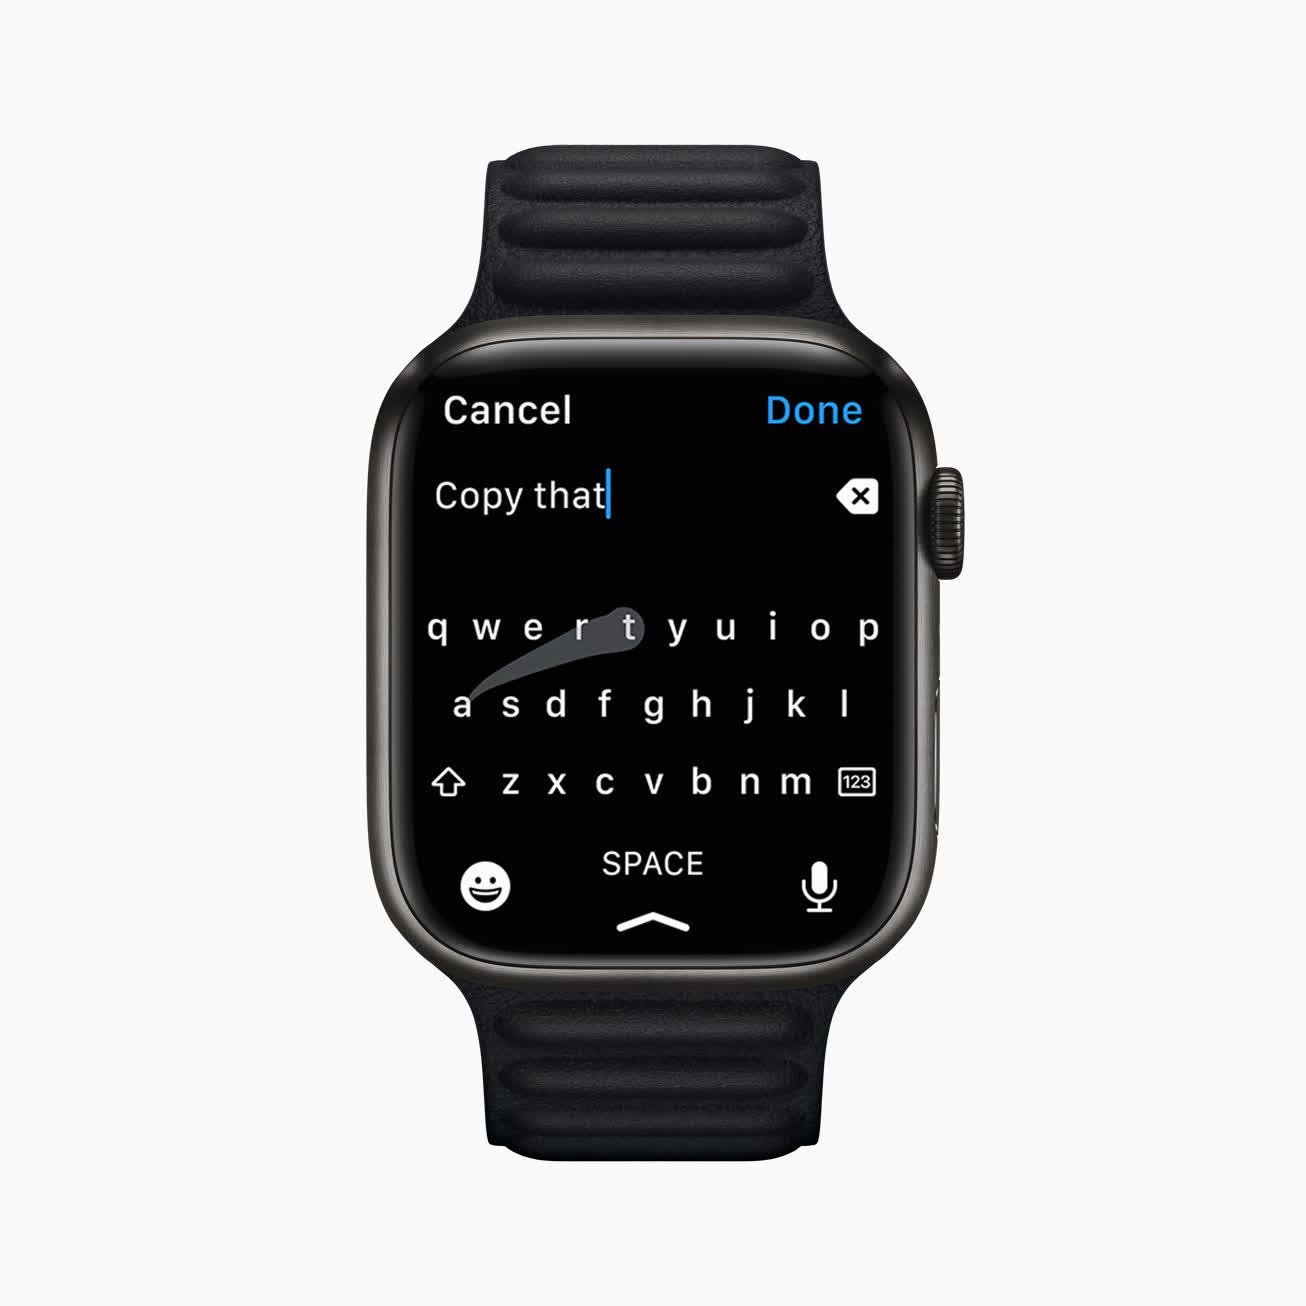 1631652486 195 LApple Watch Series 7 est plus grande plus courbee et